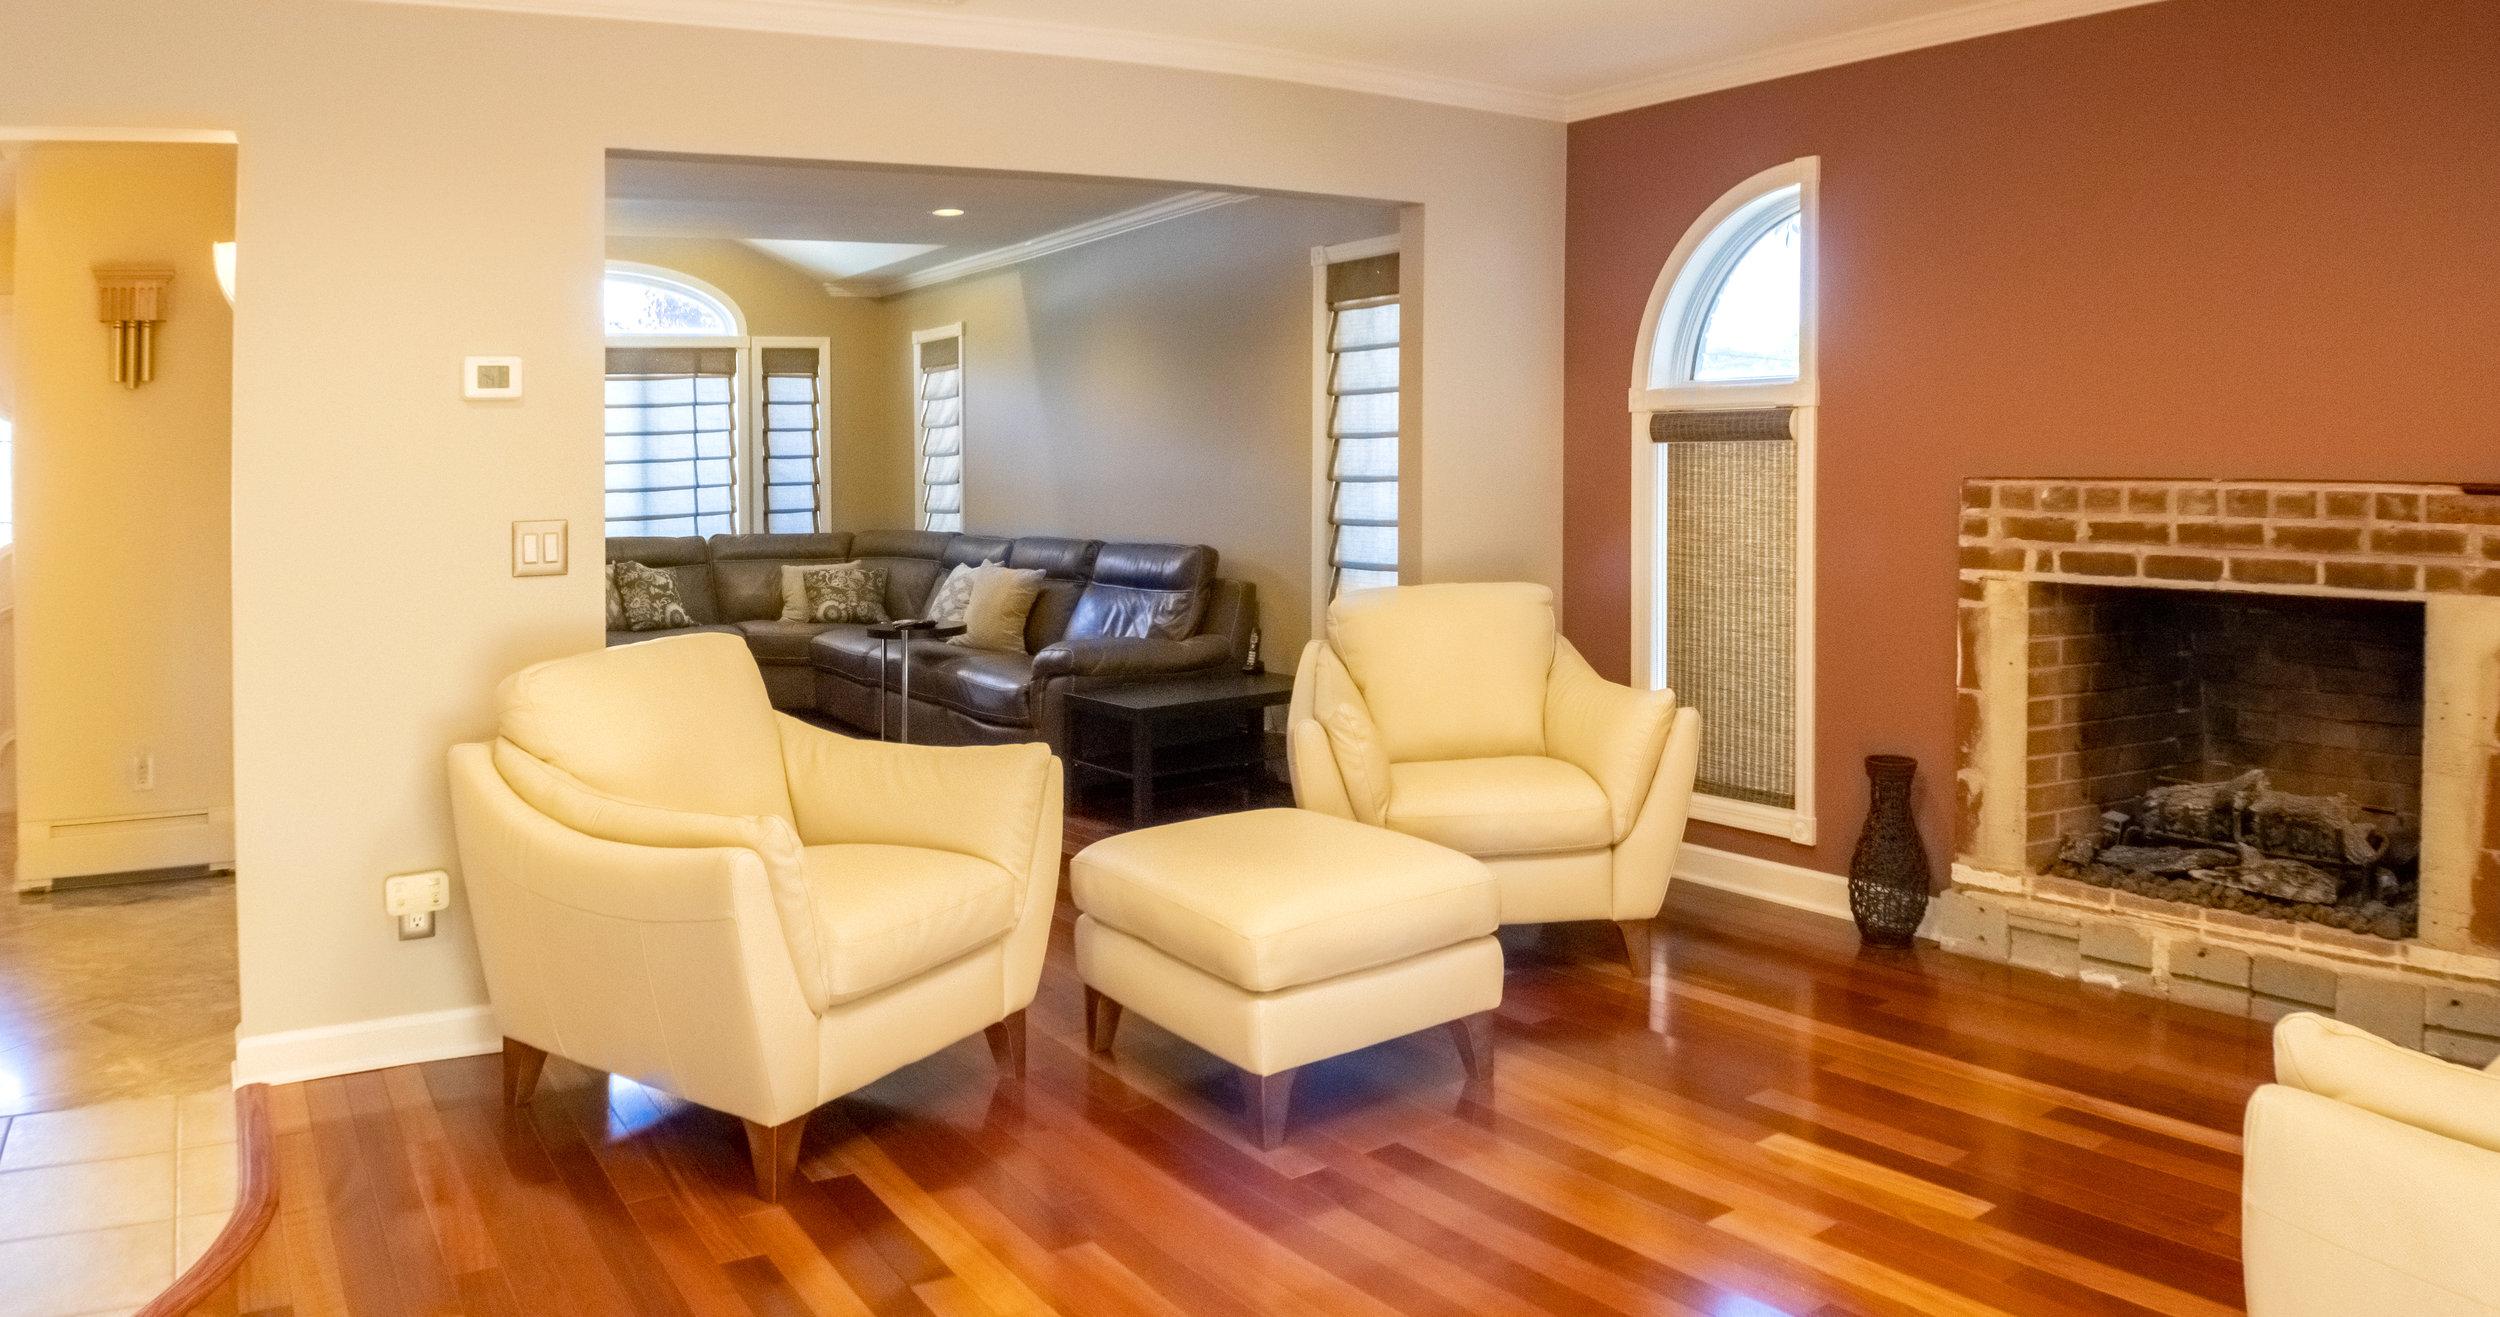 livingroom2-Pano.jpg